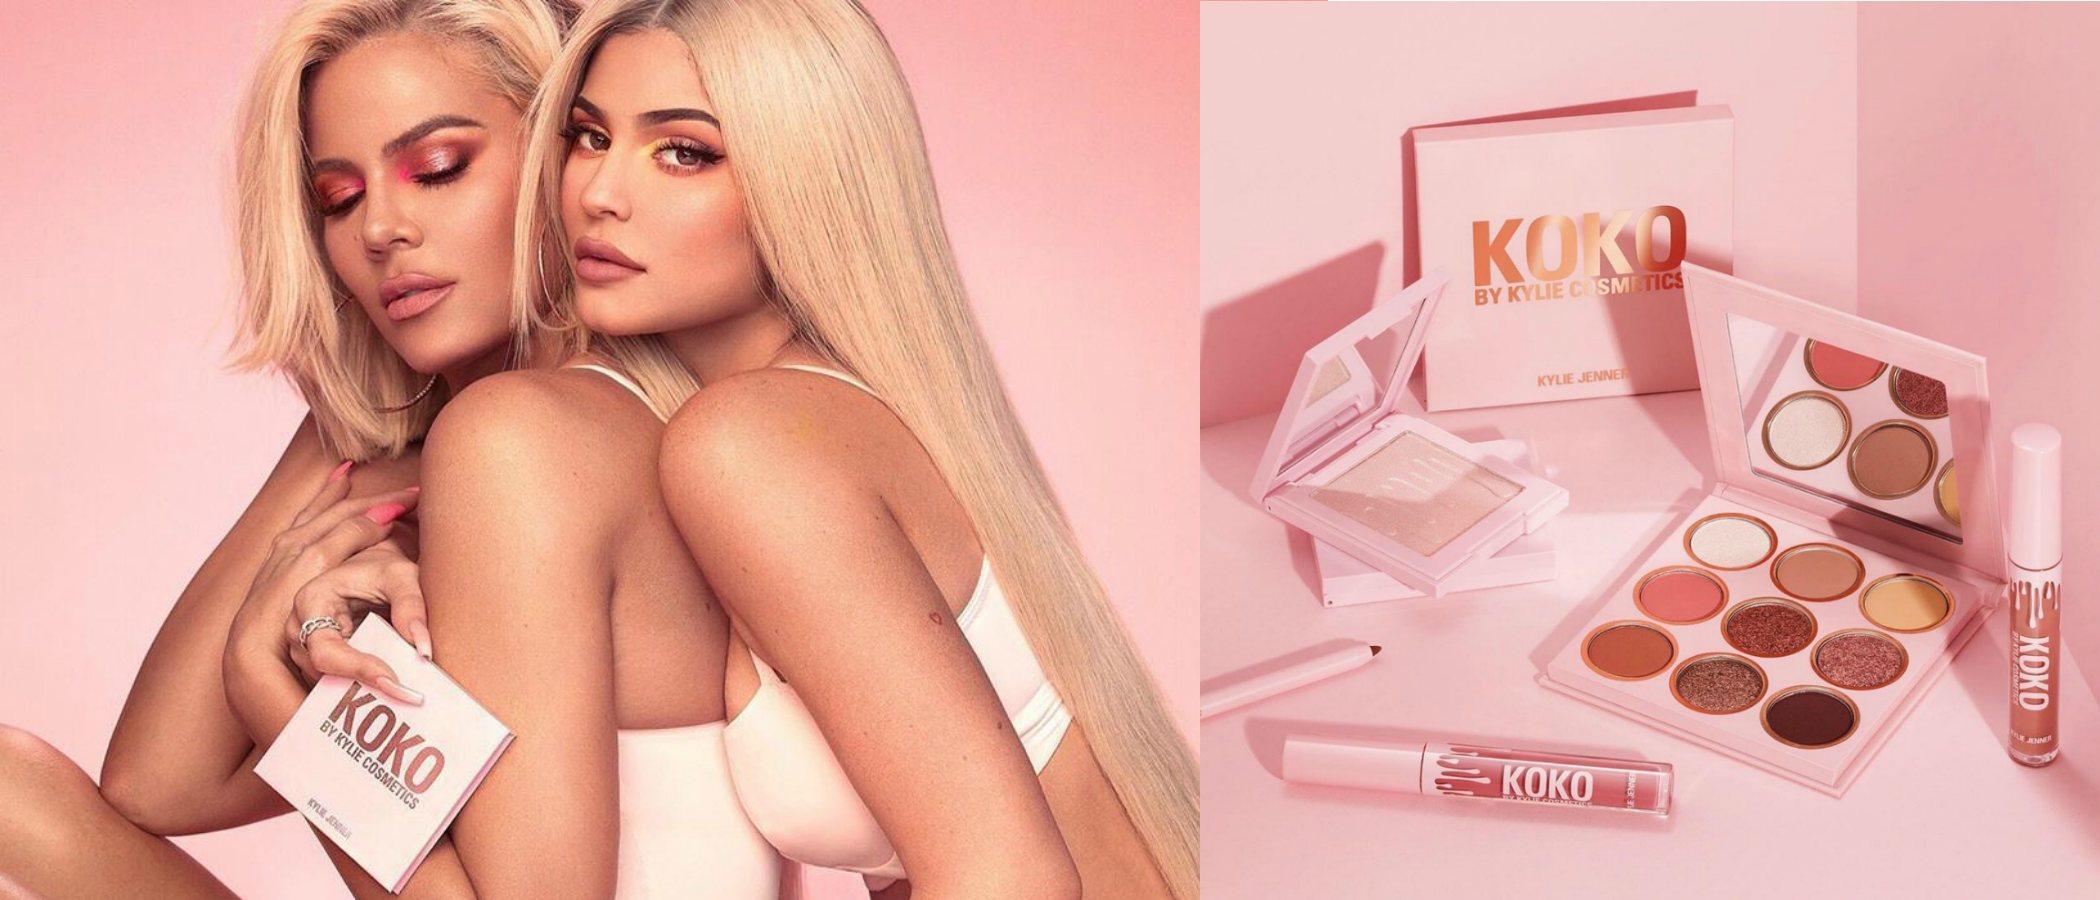 Kylie Cosmetics presenta 'Koko Kollection', la tercera colección de Kylie Jenner con Khloé Kardashian